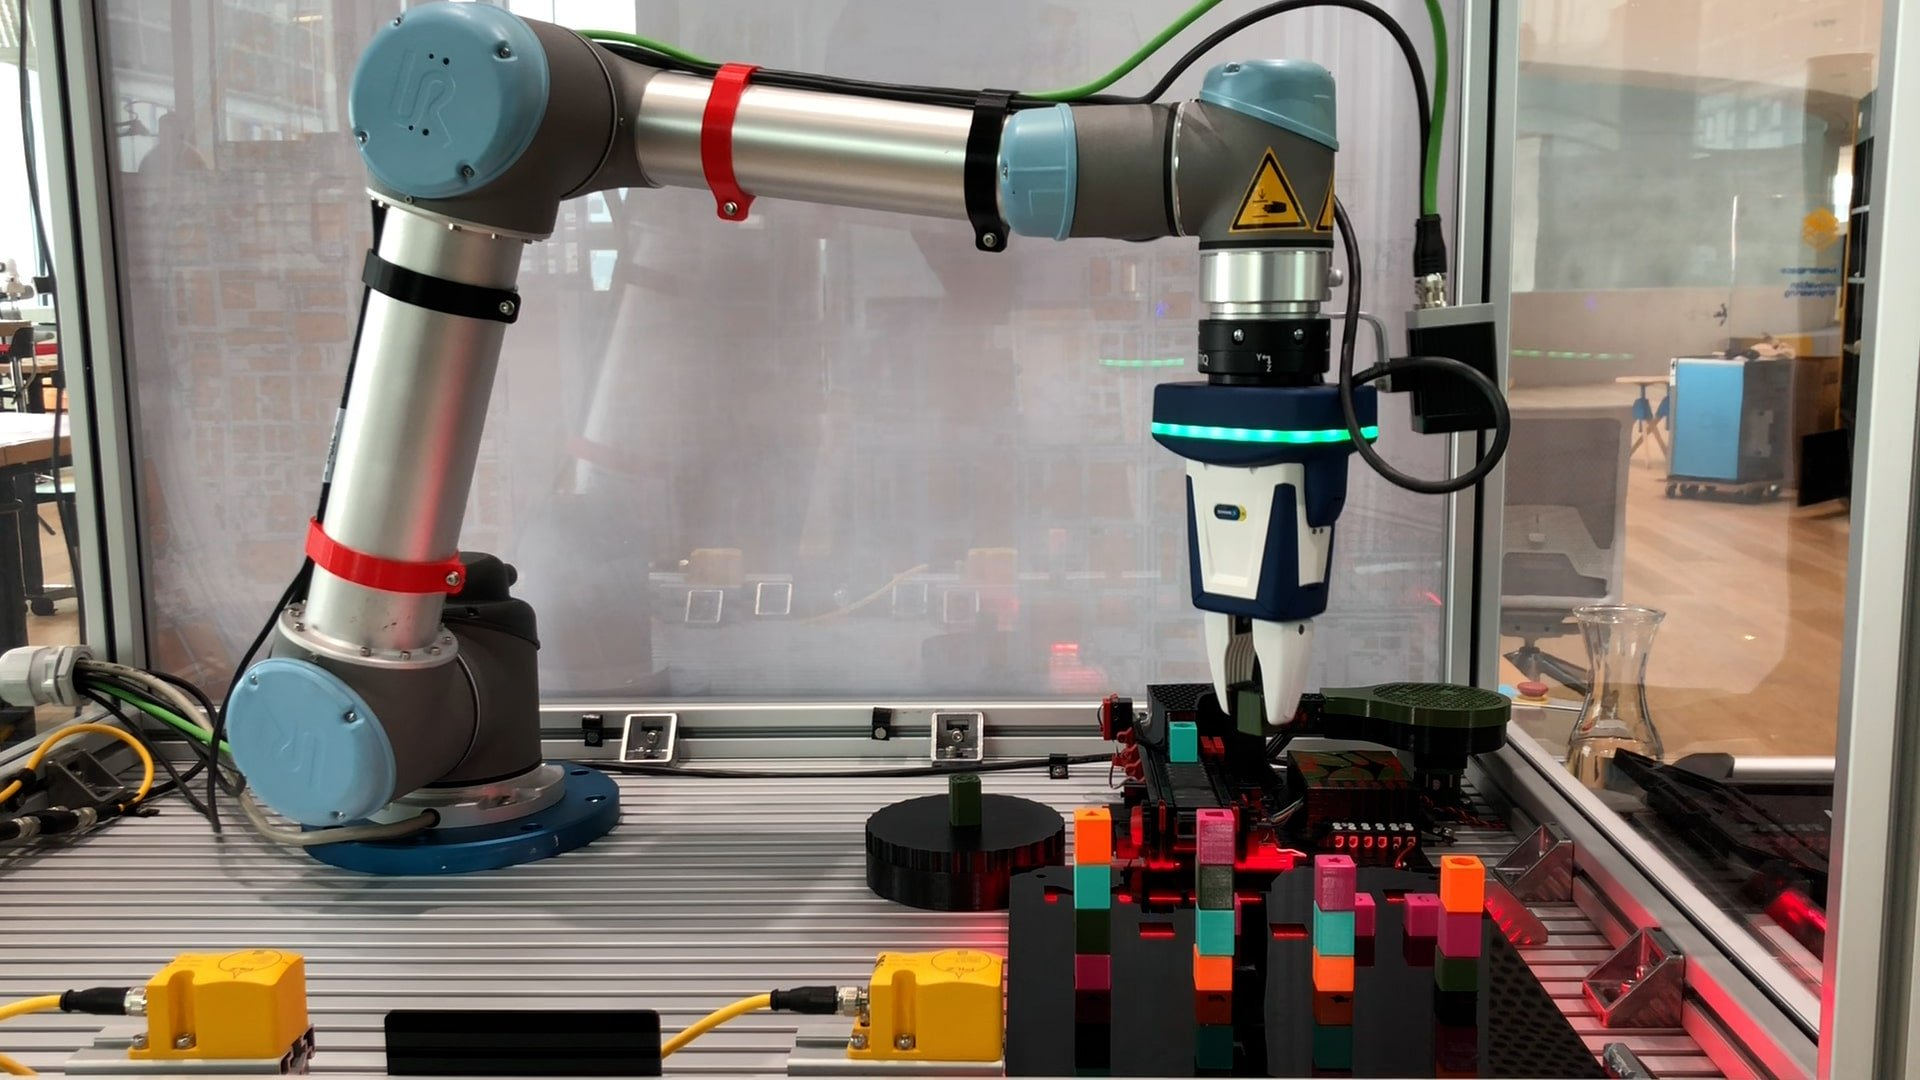 ArtiMinds-Robotics-Sortieranwendung-Cobot-Handling